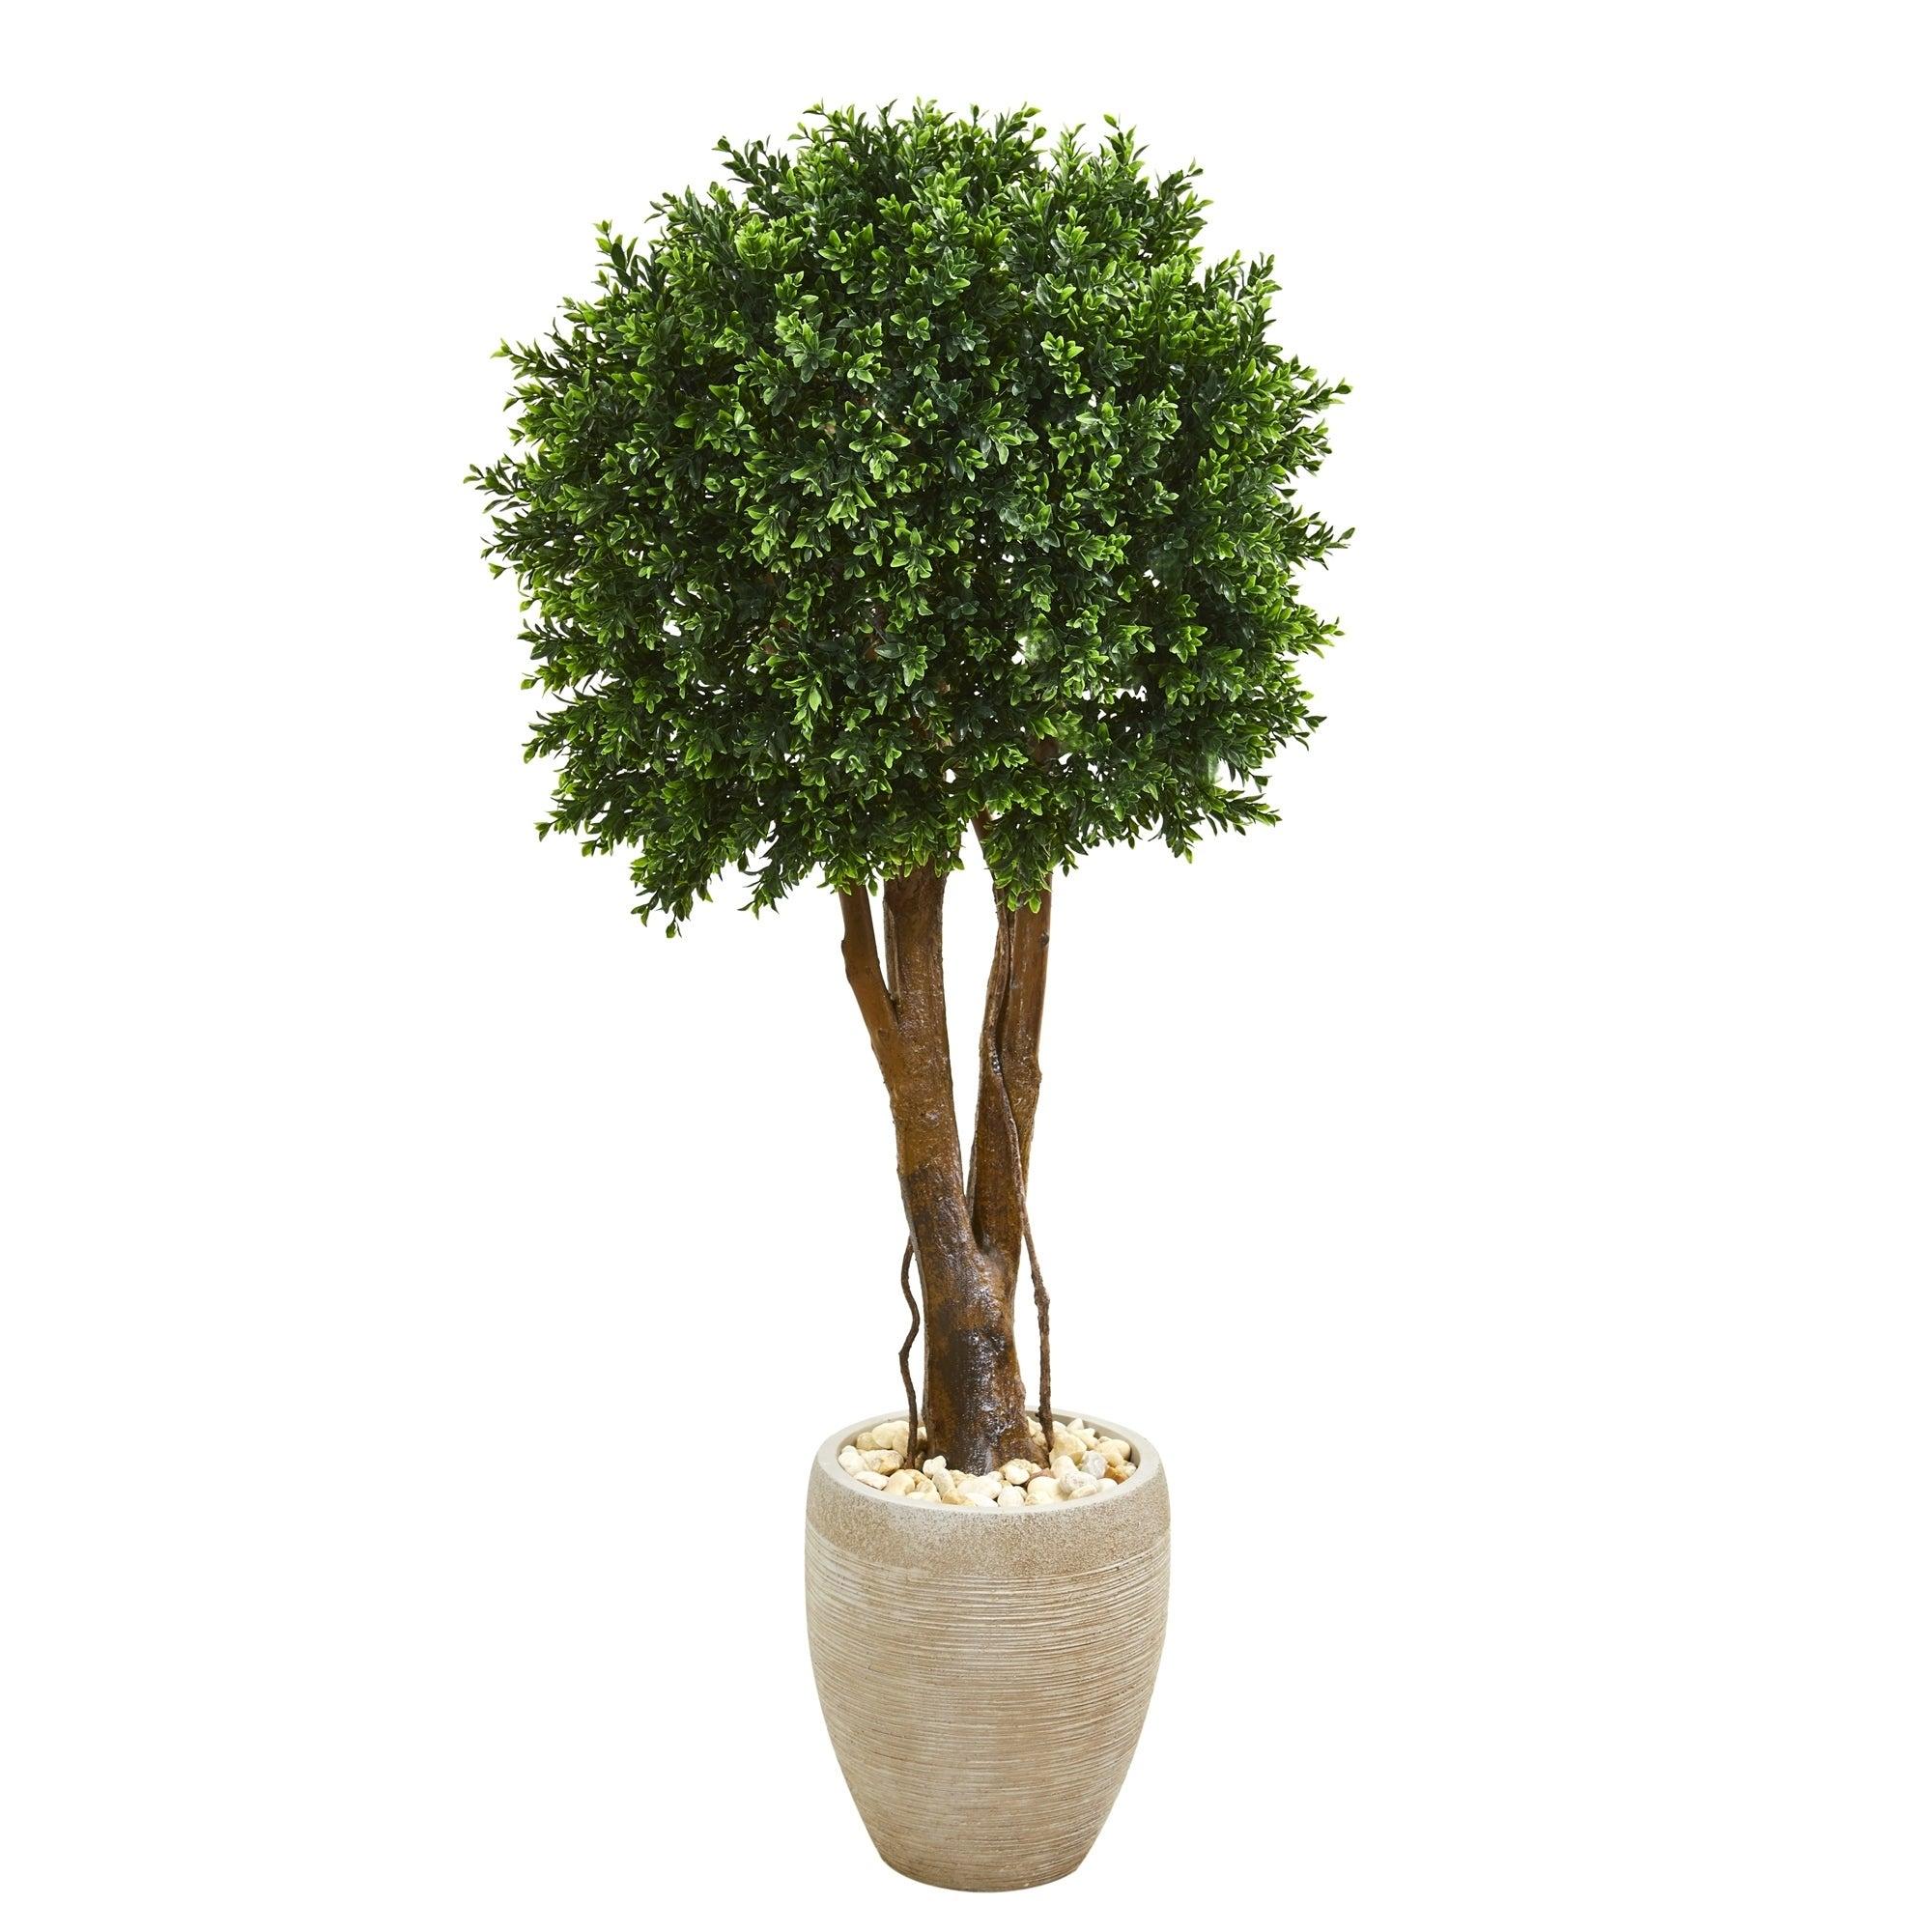 52 Boxwood Artificial Topiary Tree in Planter UV Resistant (Indoor/Outdoor)